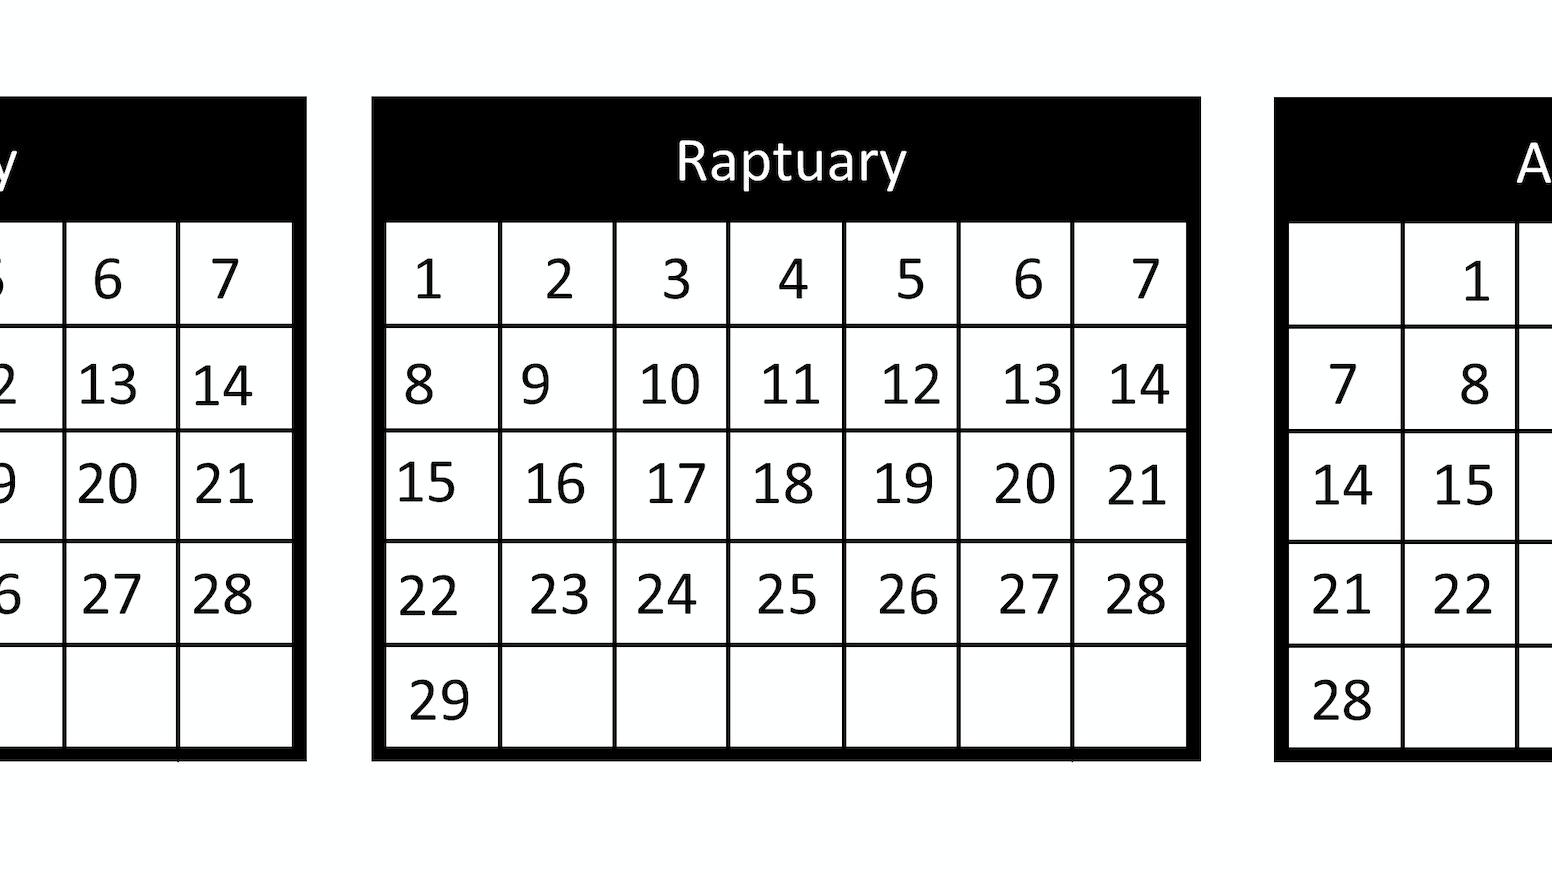 2017 raptuarial calendar by john rap kickstarter